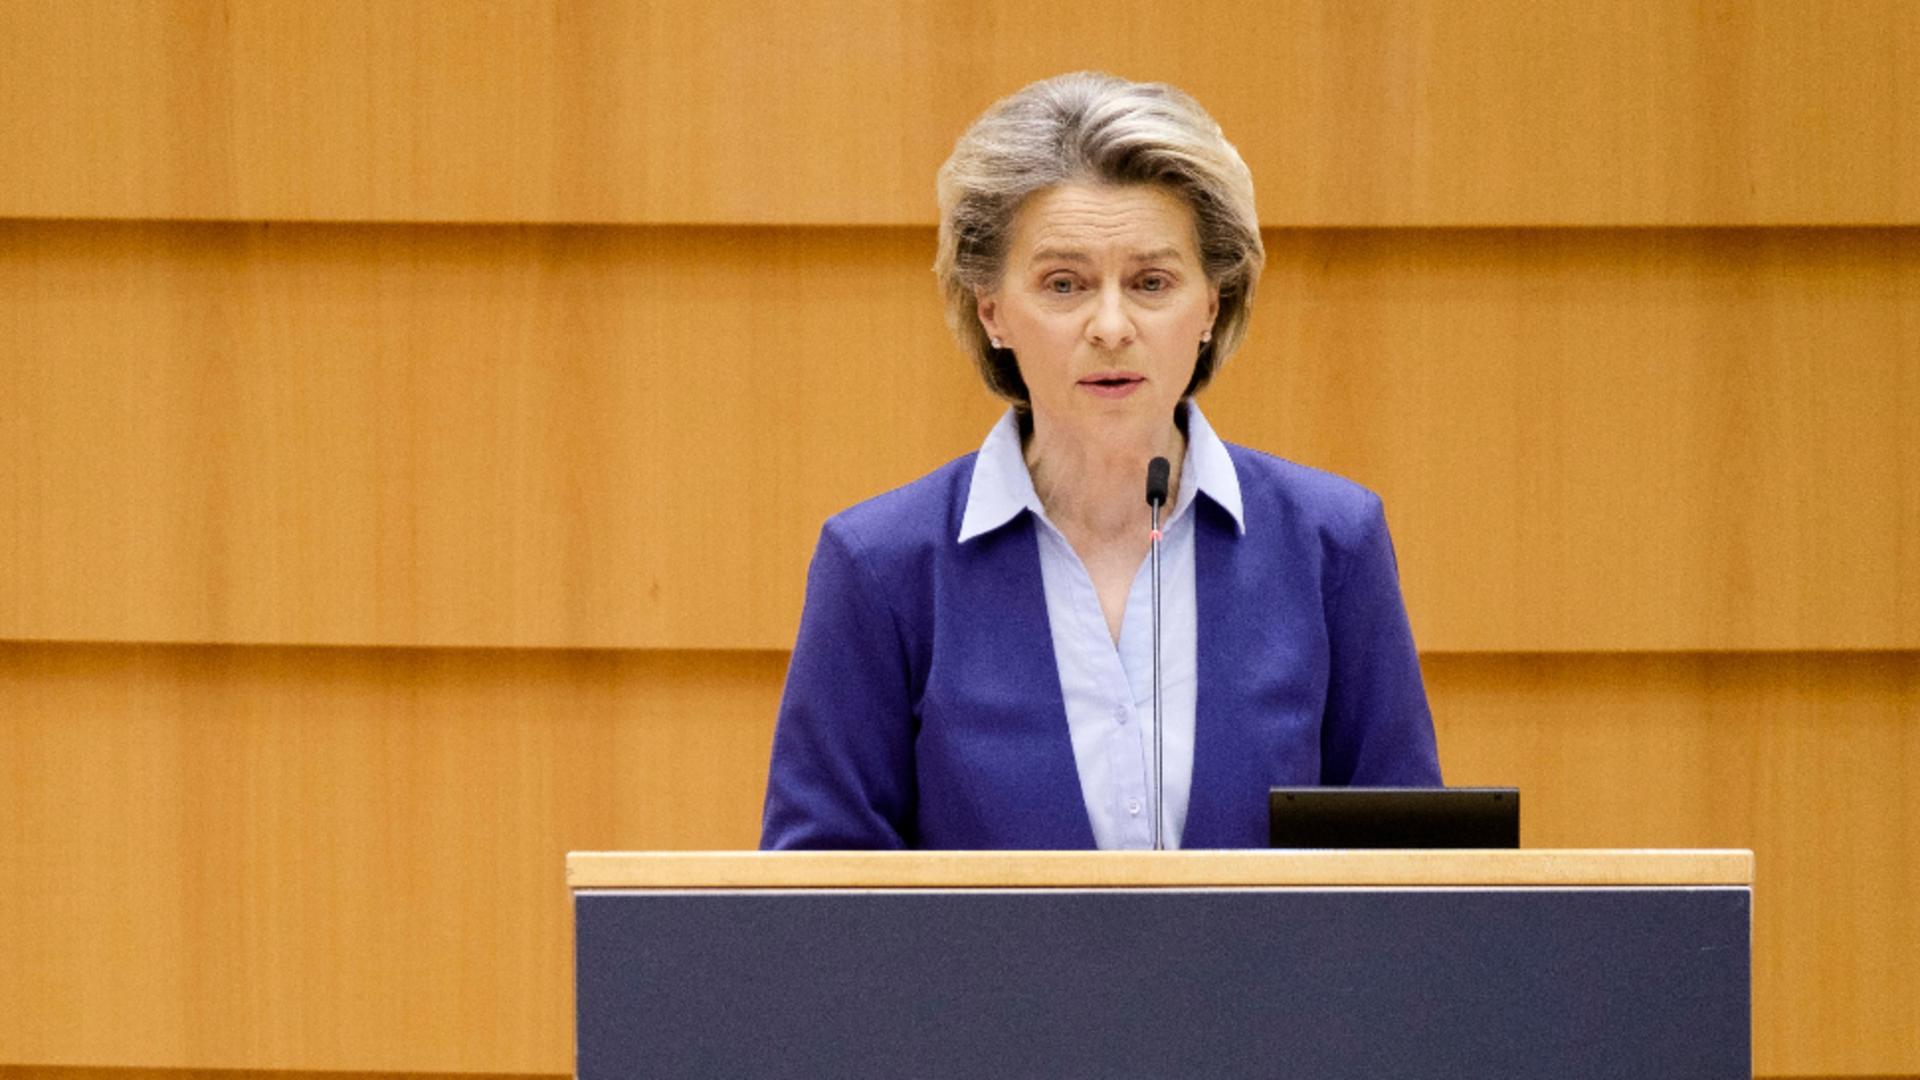 Președintele Comisiei Europene, Ursula von der Leyen / Foto: Profimedia